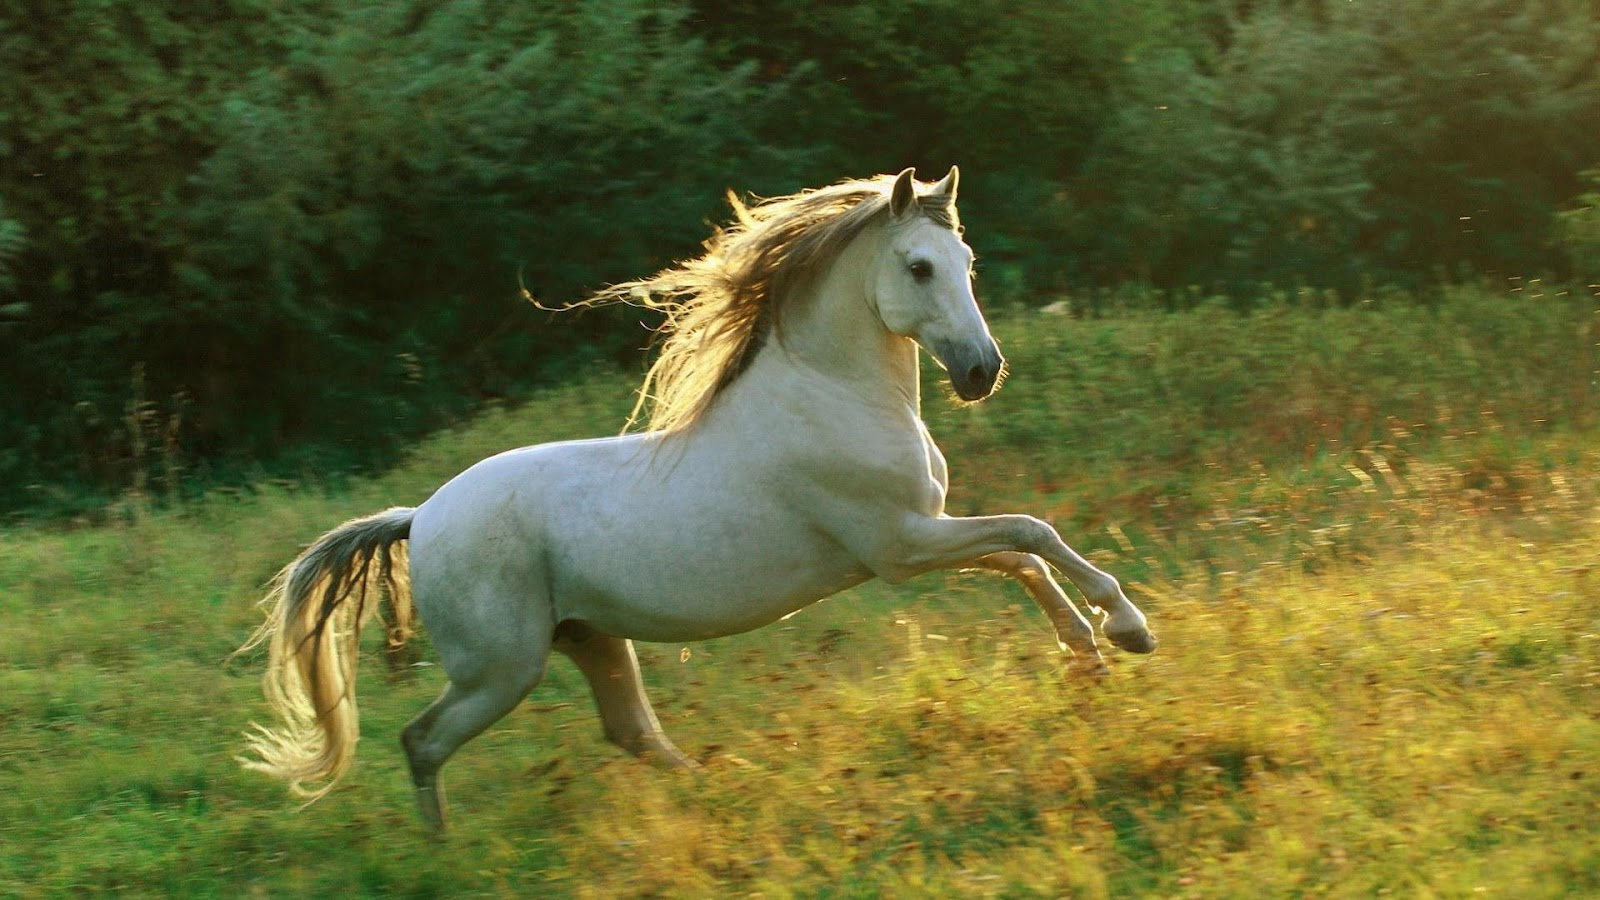 Beautiful   Wallpaper Horse Creative - MixoPlanet+(12)  Trends_993191.jpg